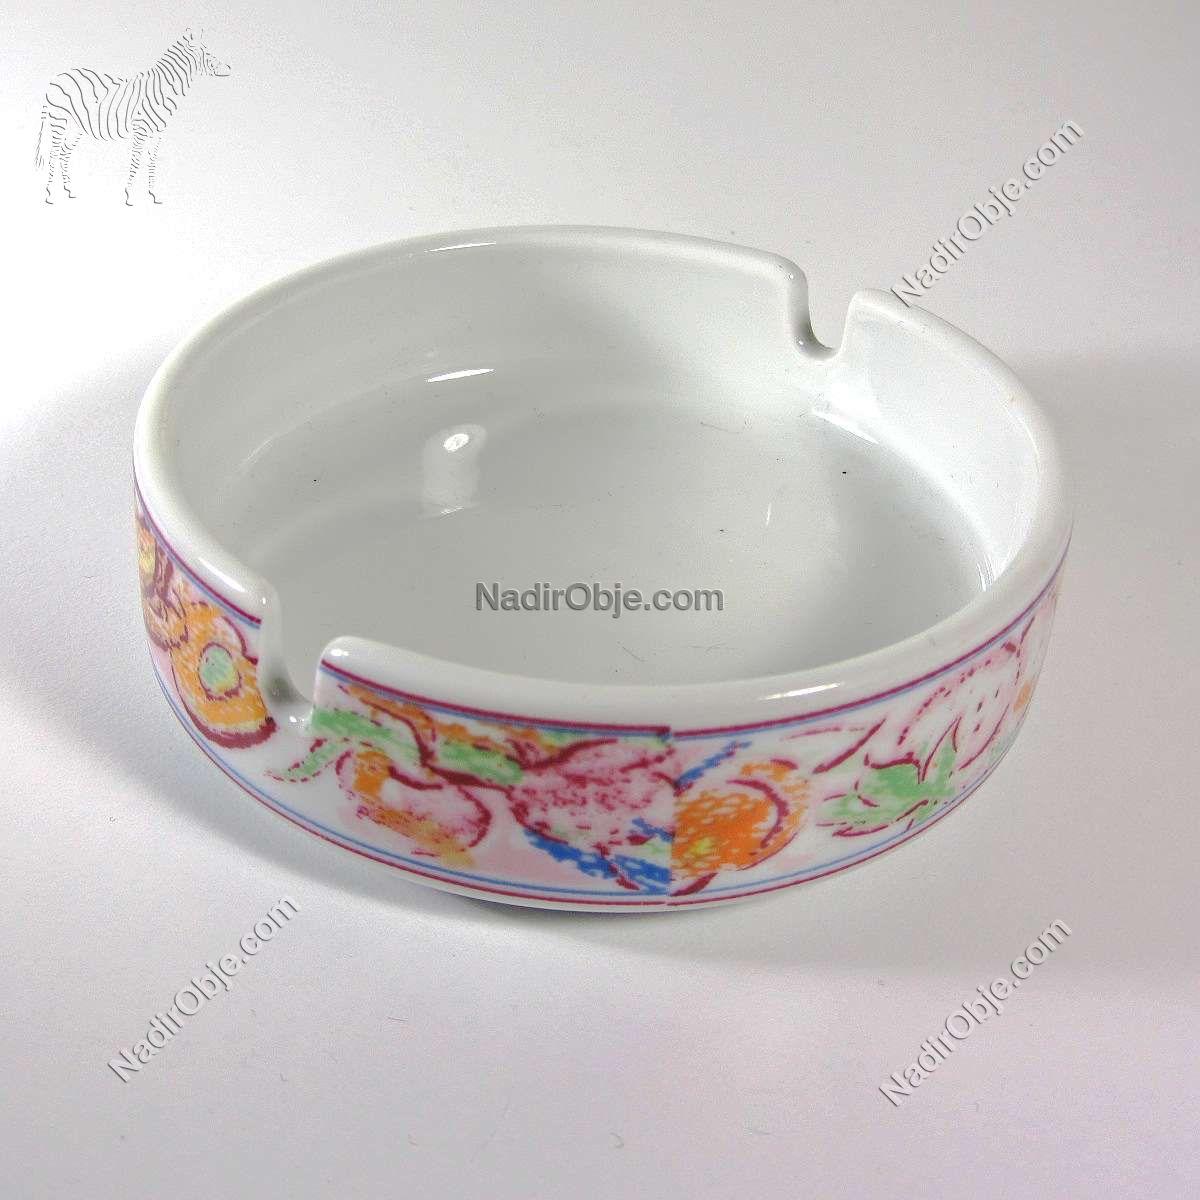 Porland Porselen Küllük Seramik-Porselen Objeler Kül Tabağı